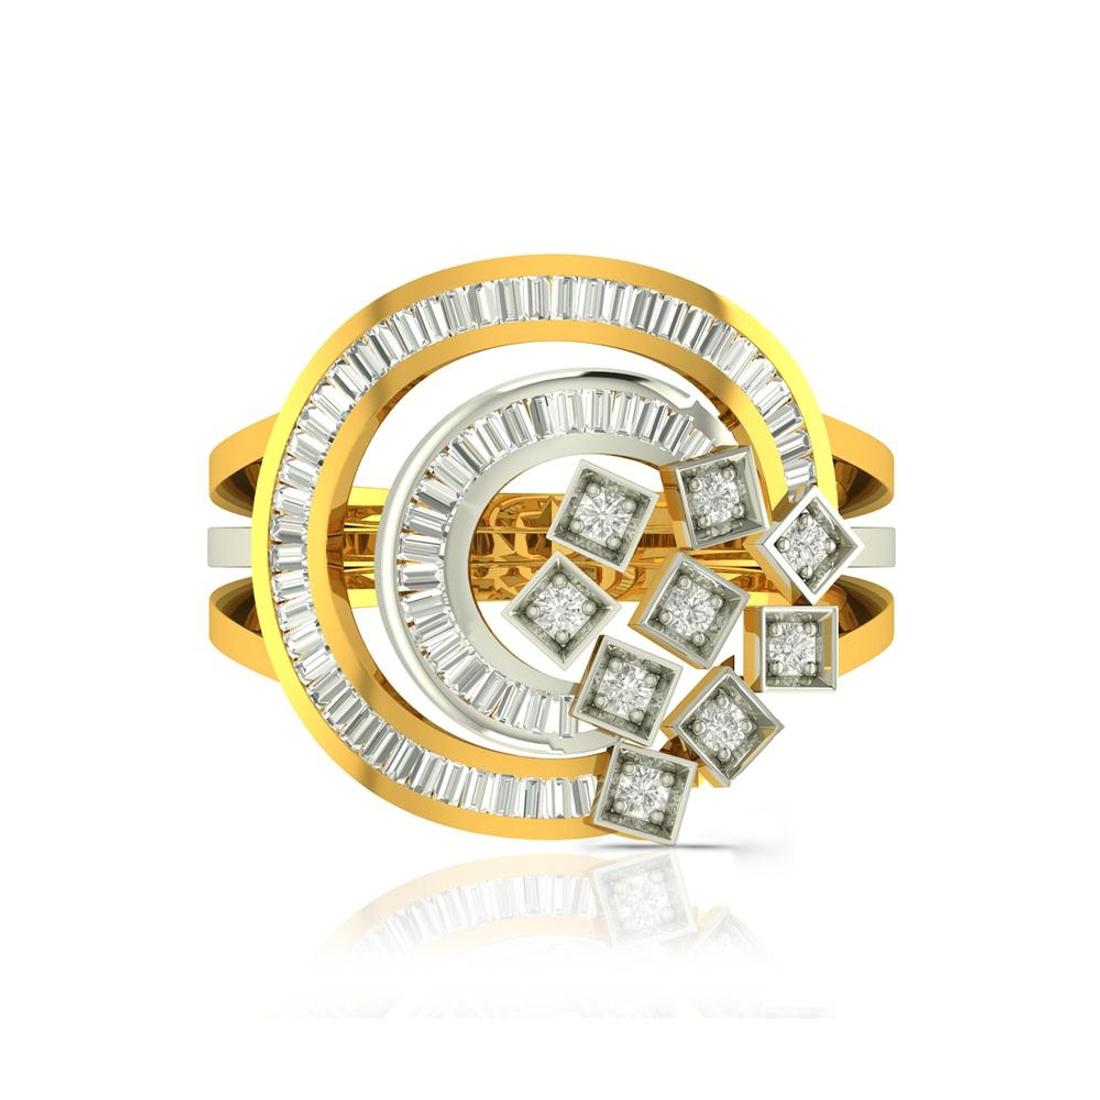 Buy Charu Jewels Diamond Ladies Ring CJLR0670 Online in India